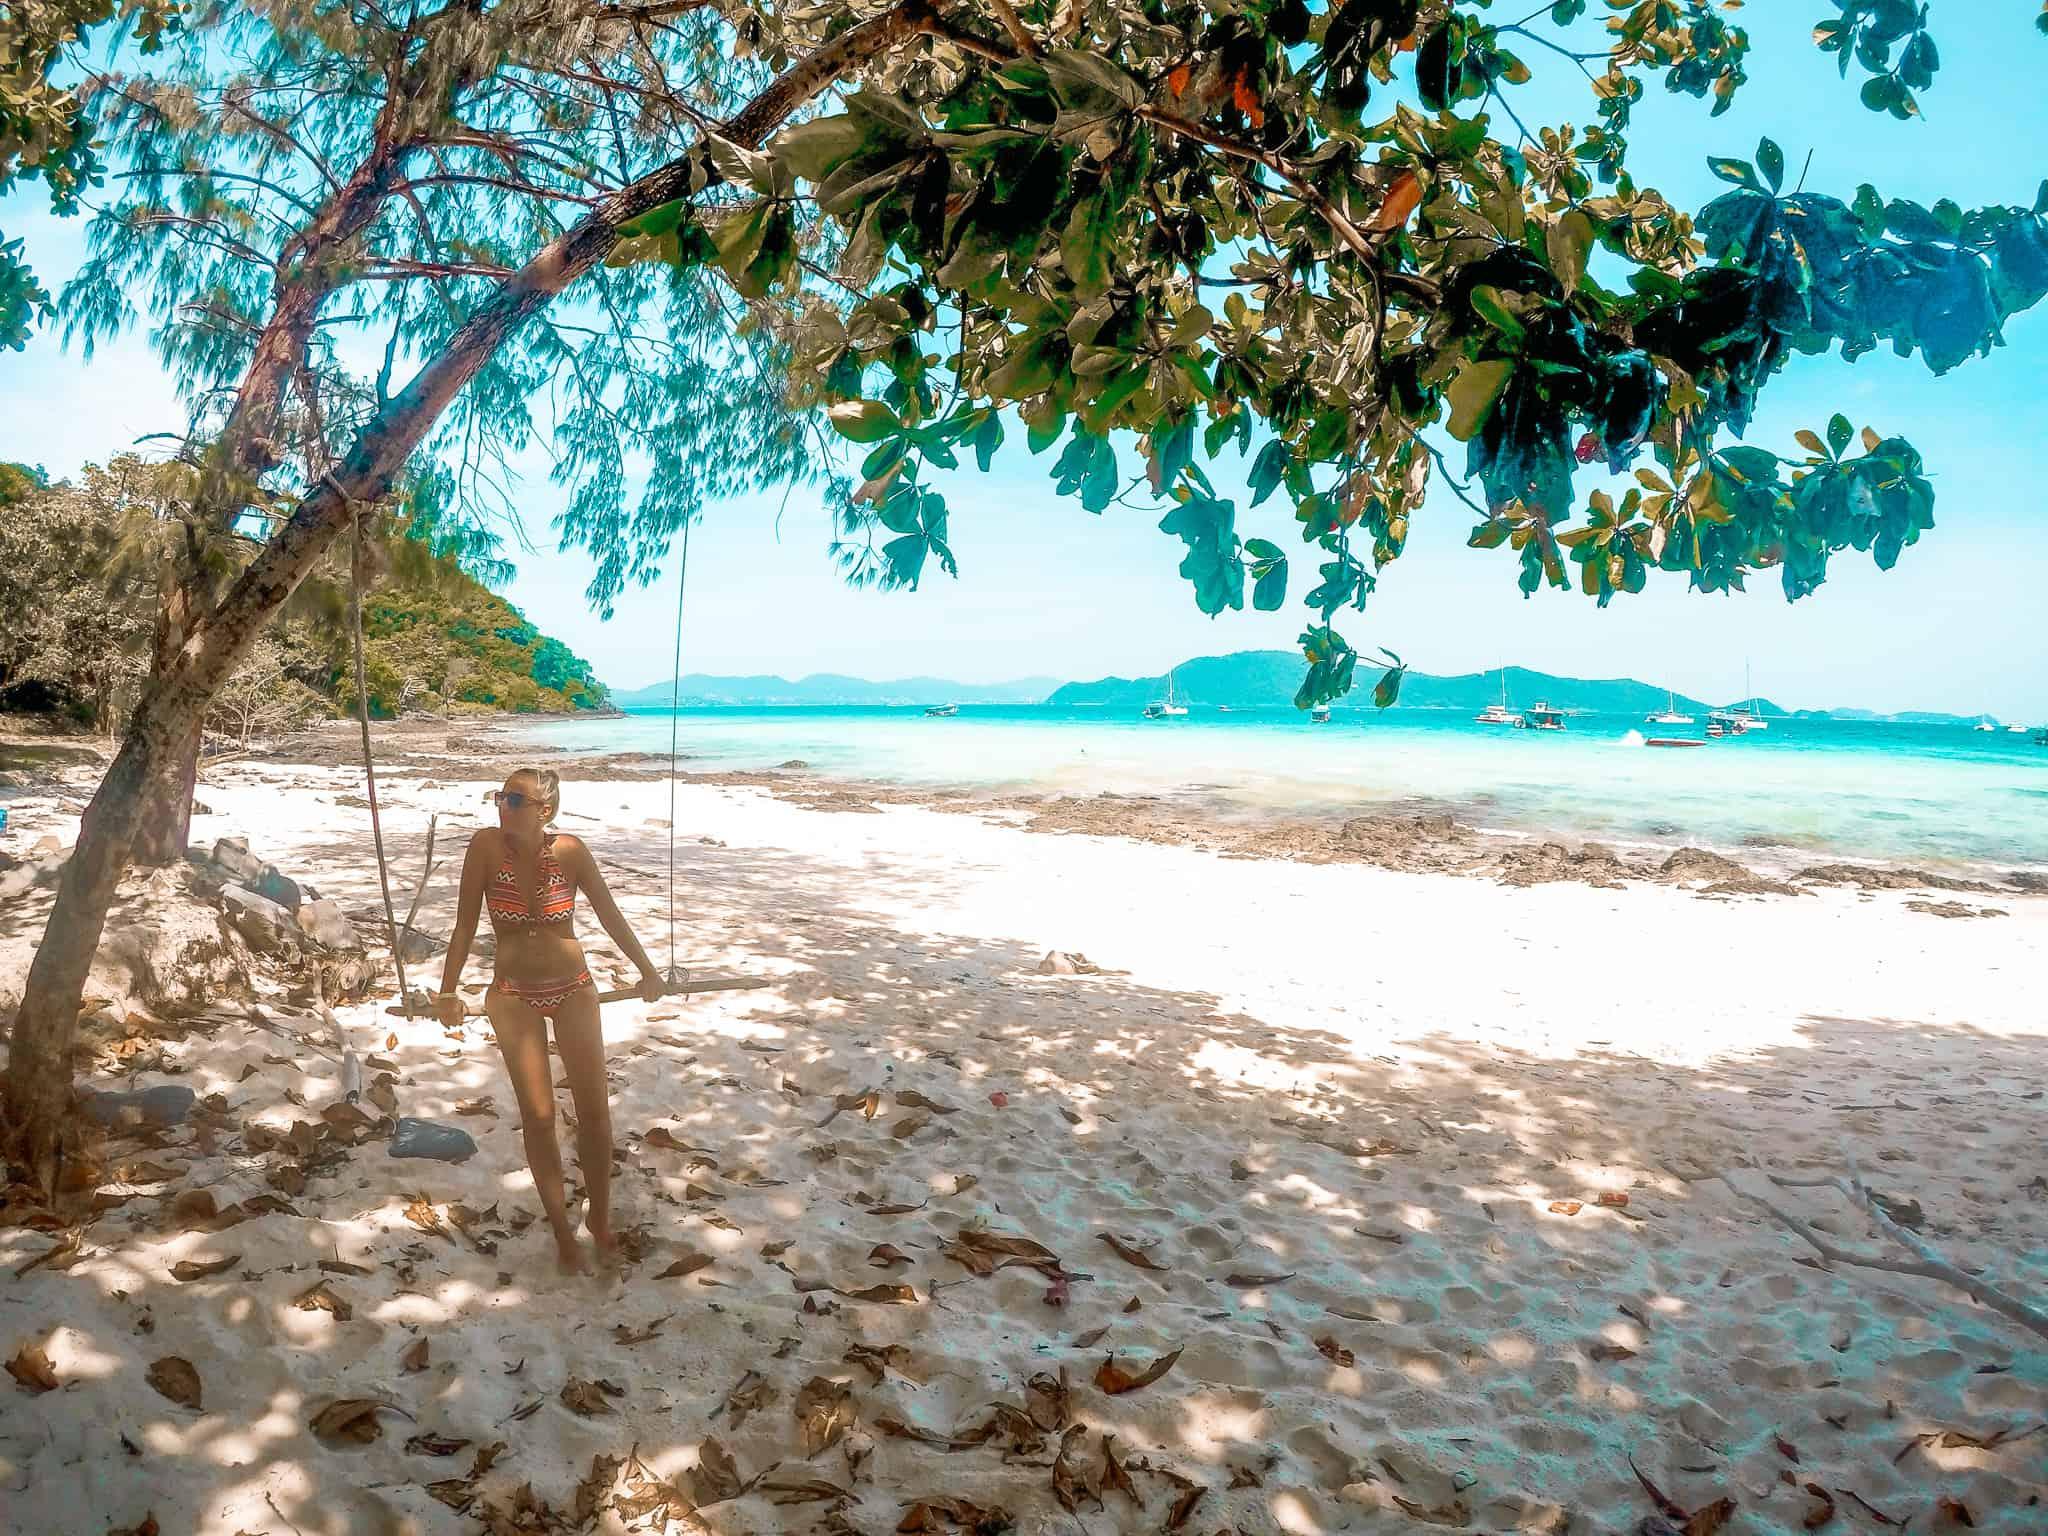 Coral Island - empfehlenswerter Strand in Phuket